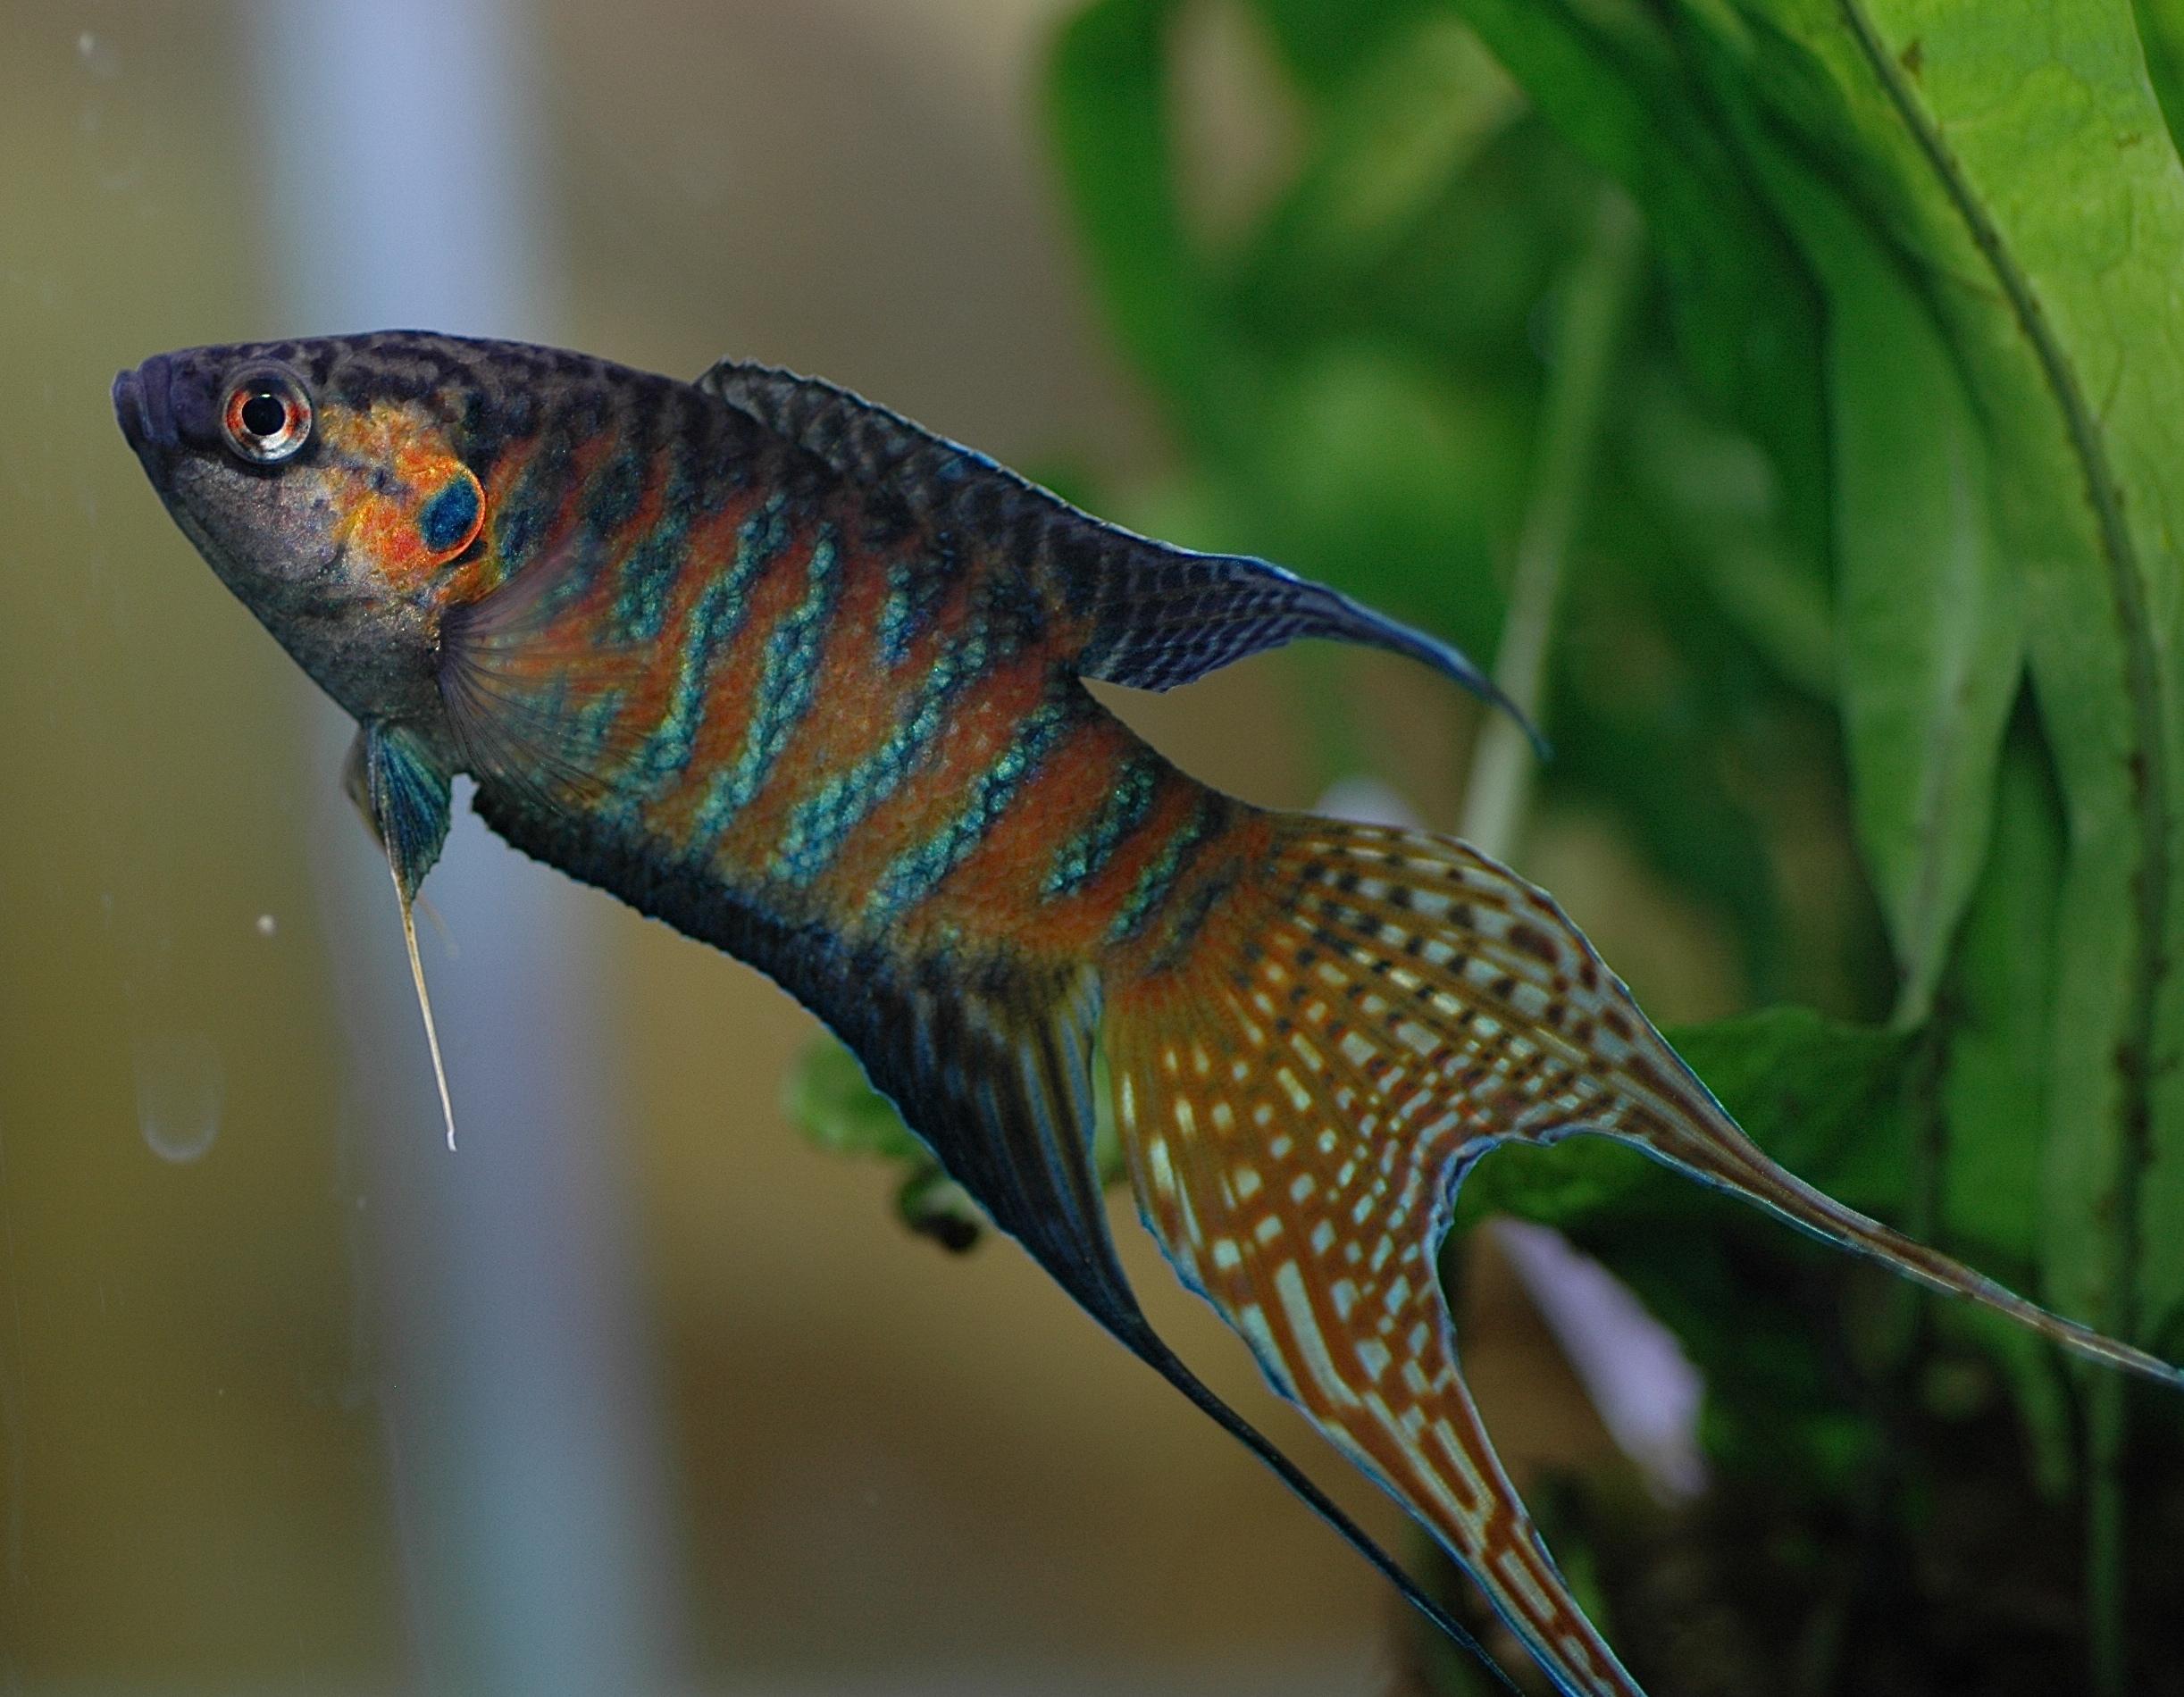 Paradise fish underwater wallpaper